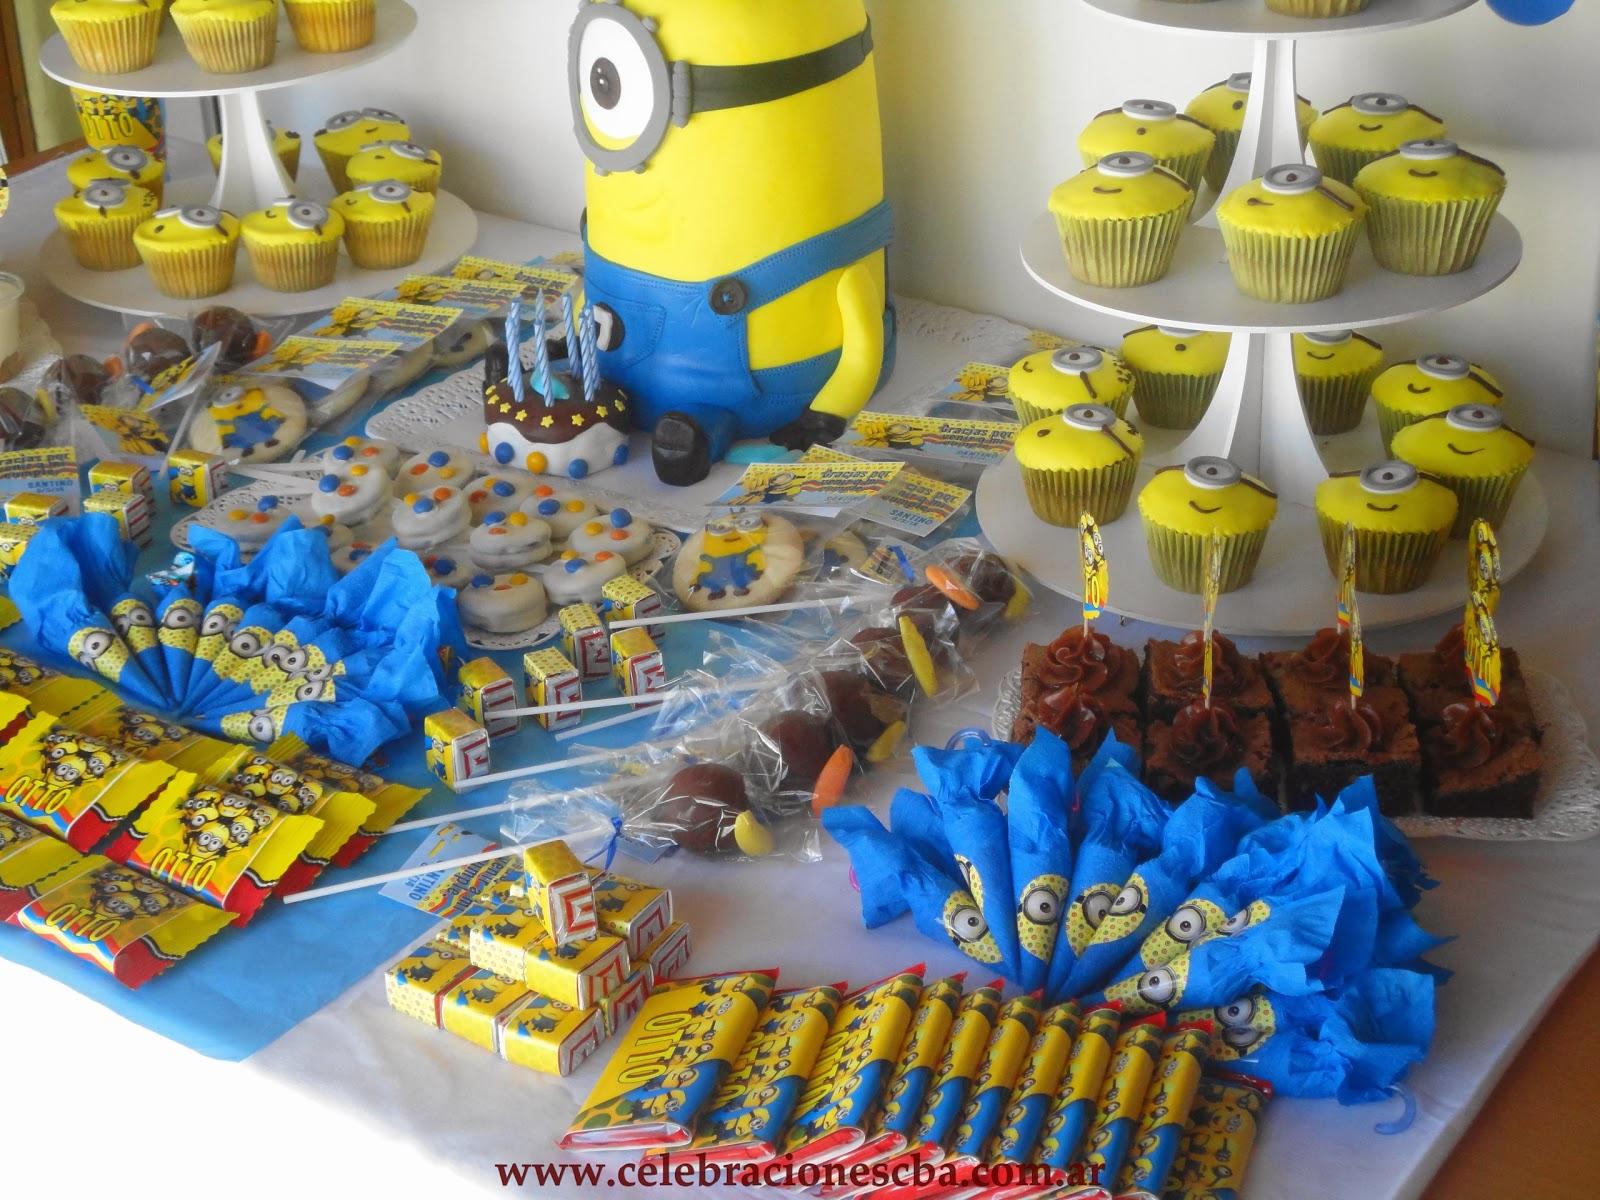 Decoracion mesa de cumplea os minions for Decoracion de mesa de cumpleanos